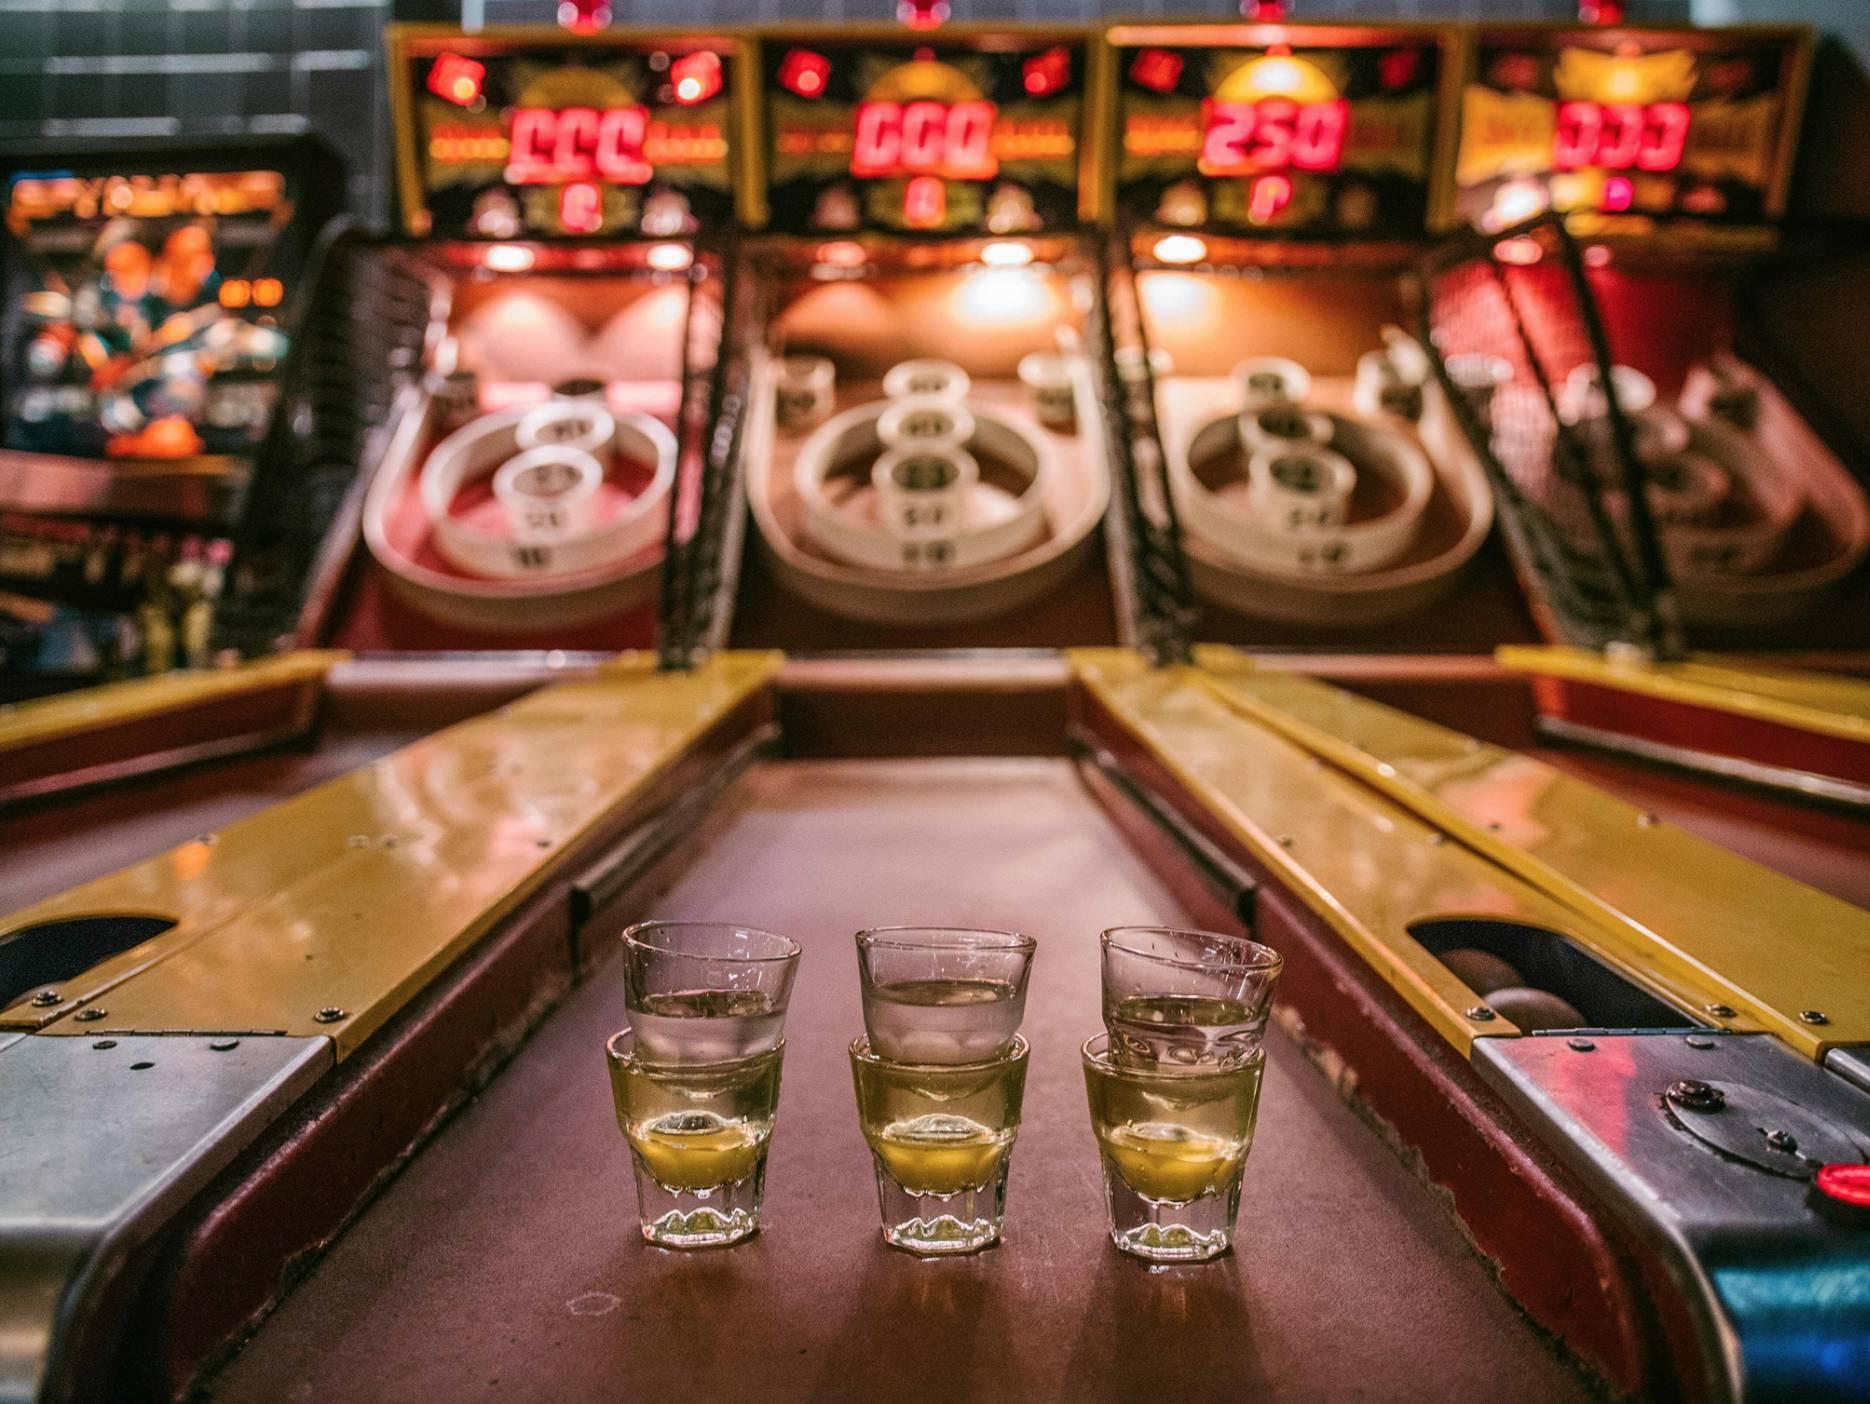 Free Game Play & $4 Mimosas